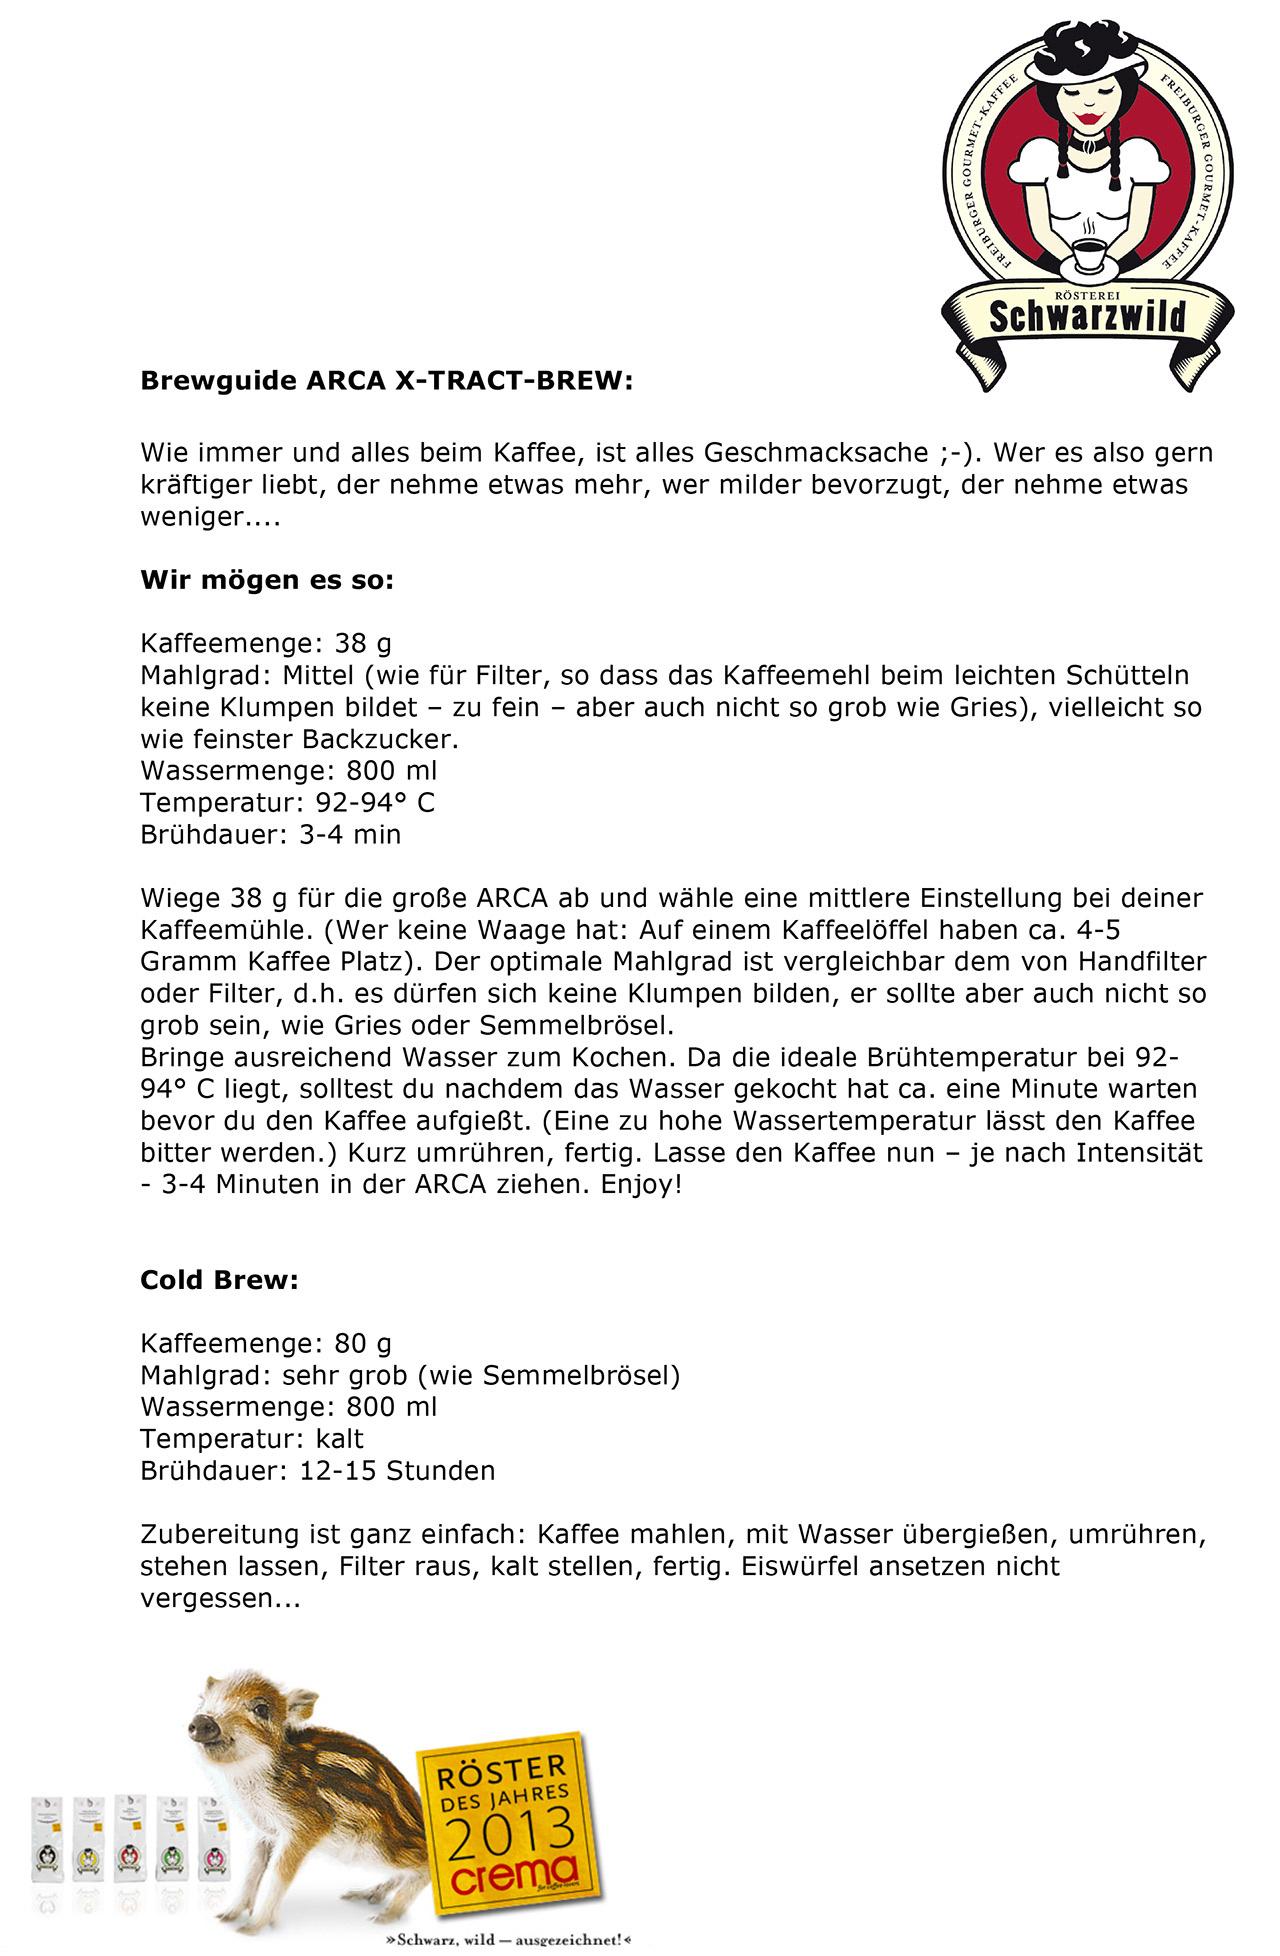 Brewguide Schwarzwald Kaffee